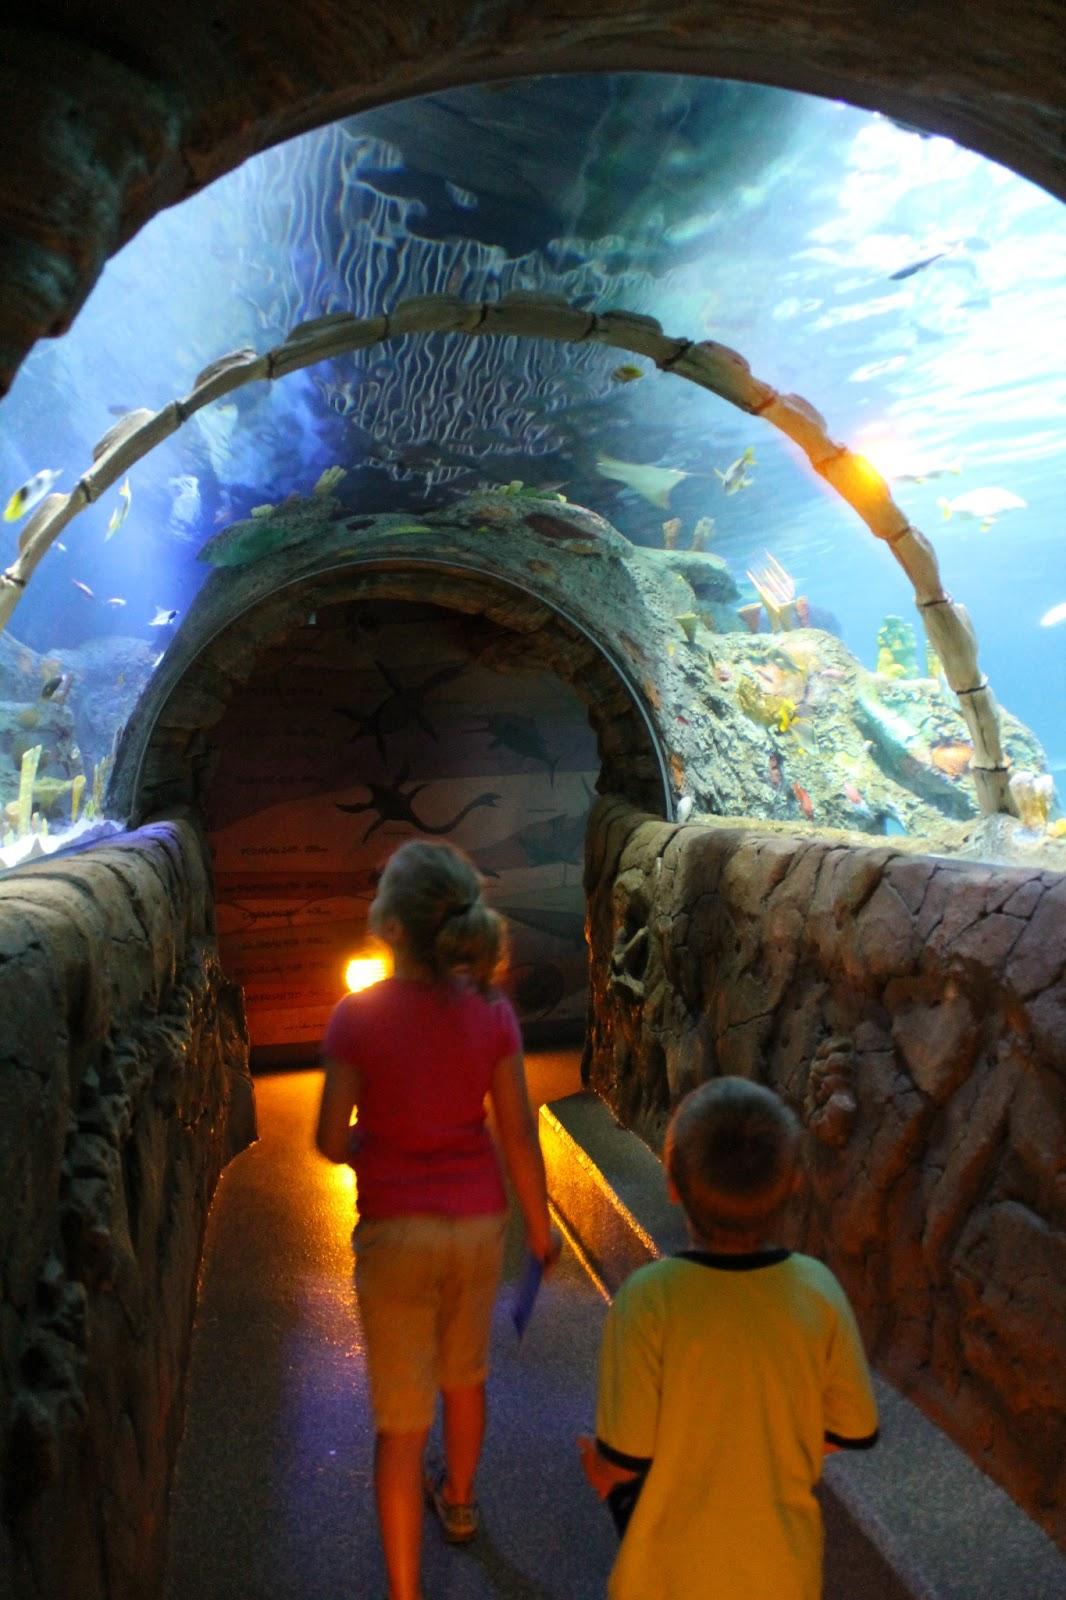 adventures among us sea life aquarium kansas city mo. Black Bedroom Furniture Sets. Home Design Ideas